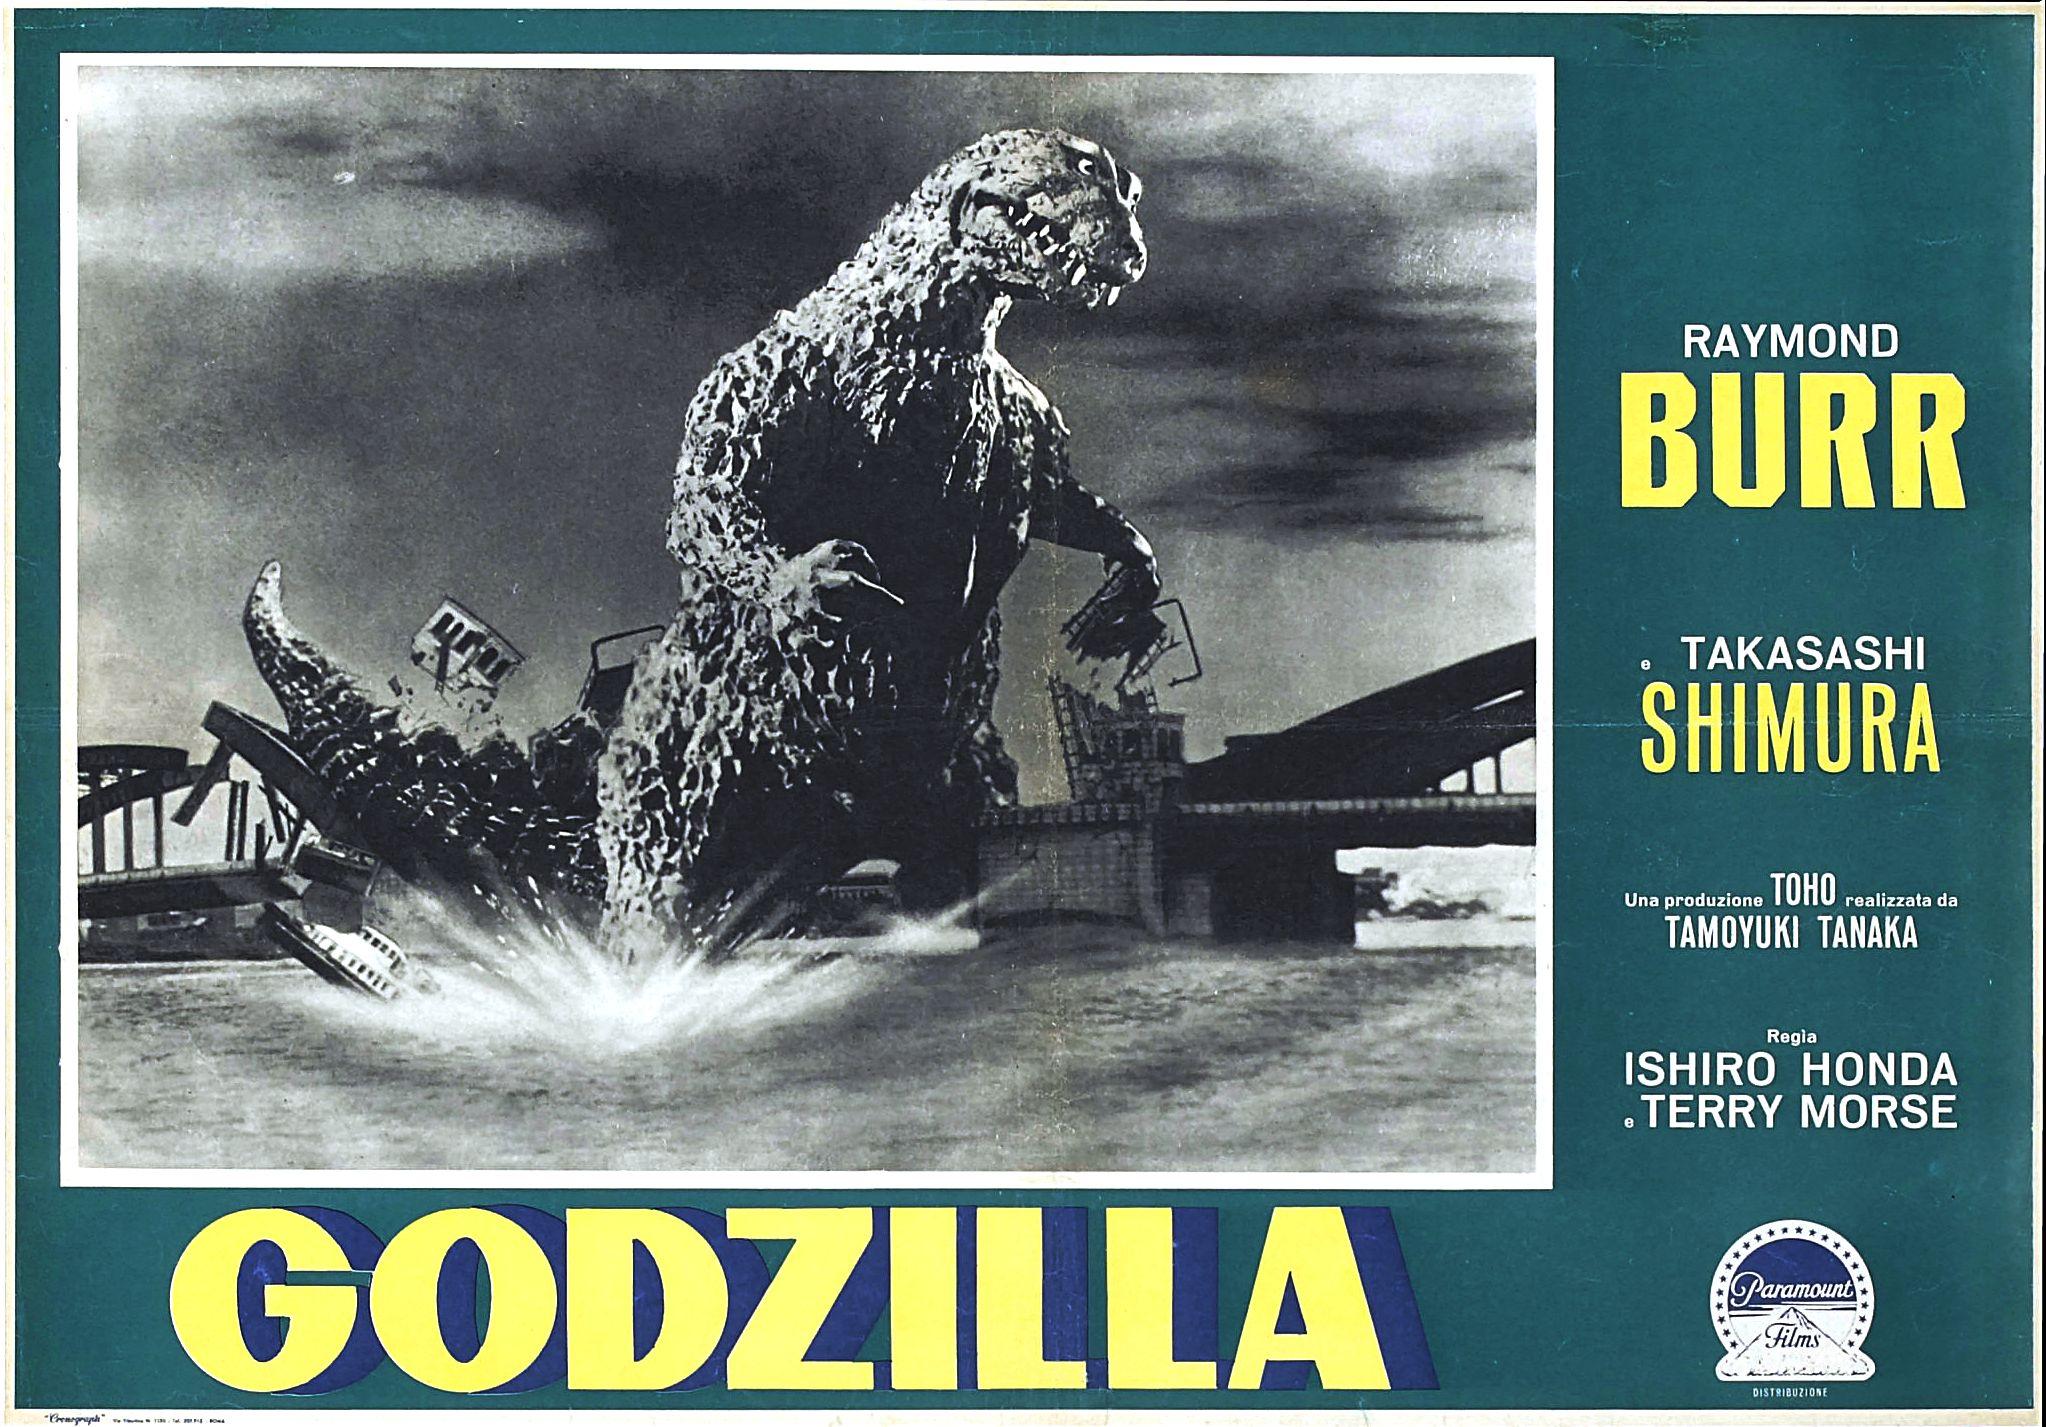 Godzilla (1954) Theatrical Poster